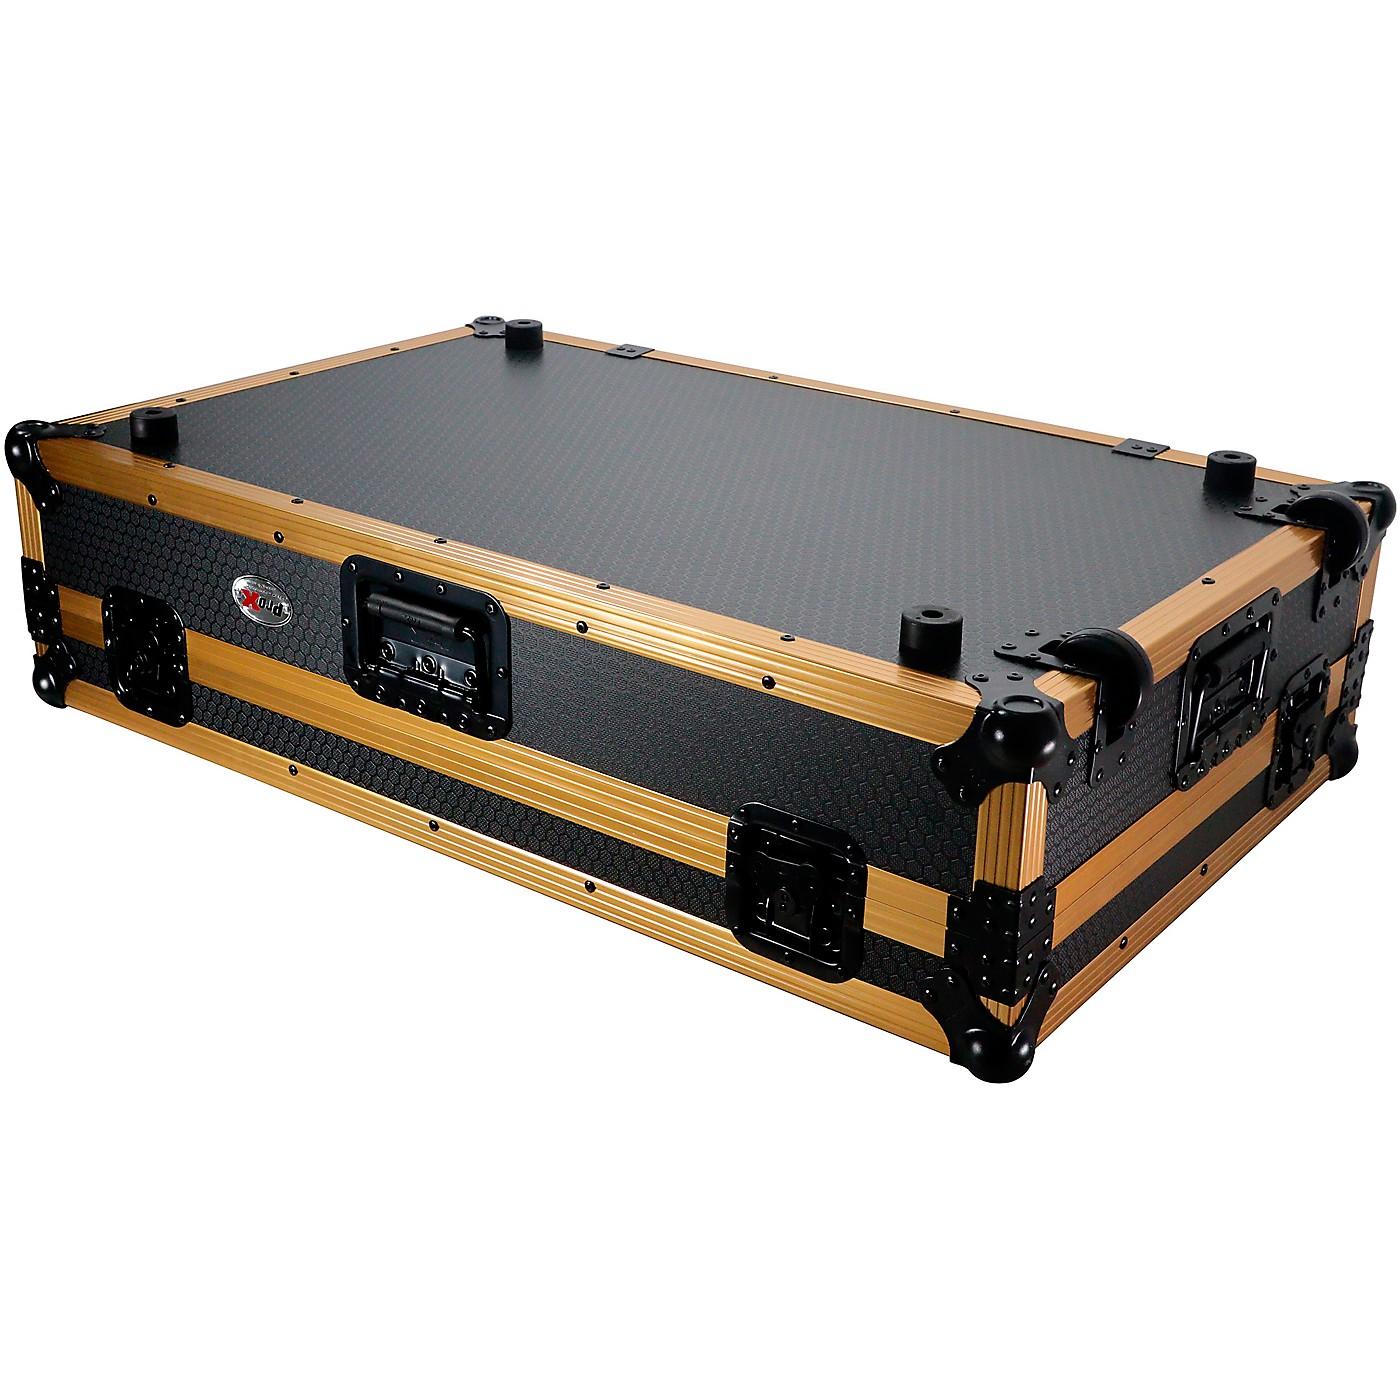 ProX ProX Case fits DDJ-1000, DDJ-SX, FLX6 and MC7000 with Gold Aluminum Frame thumbnail